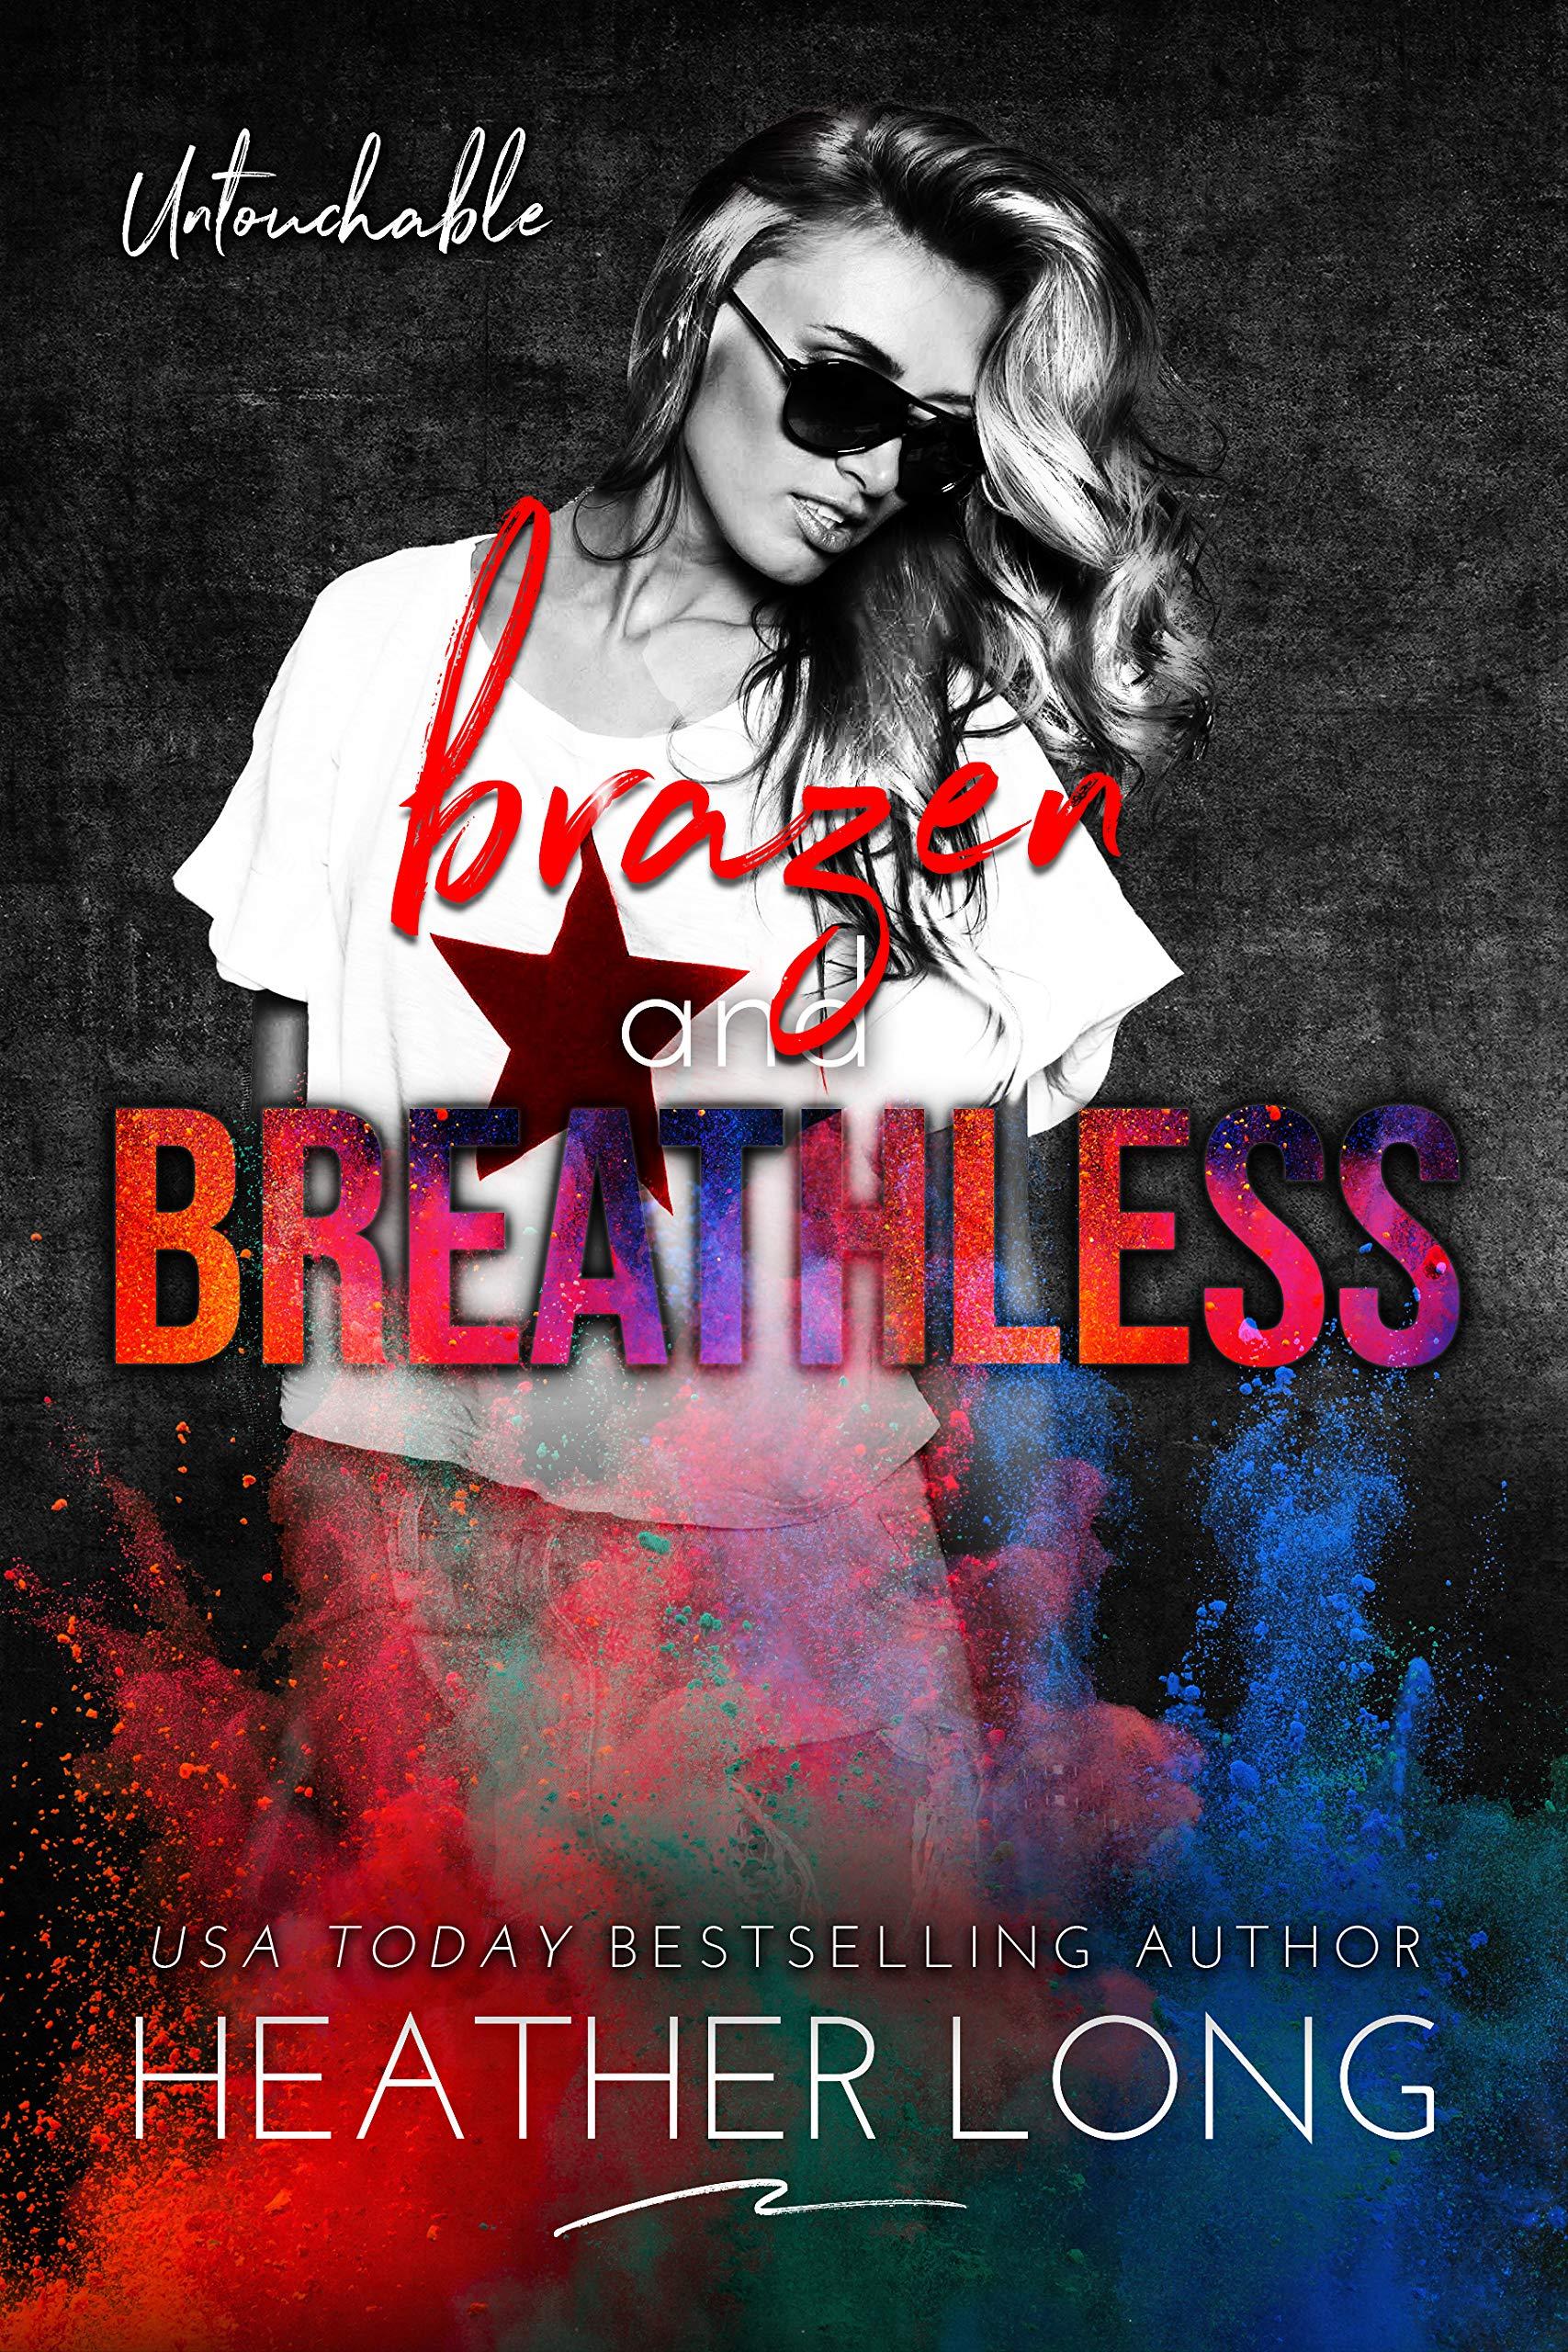 Brazen and Breathless (Untouchable Book 6)